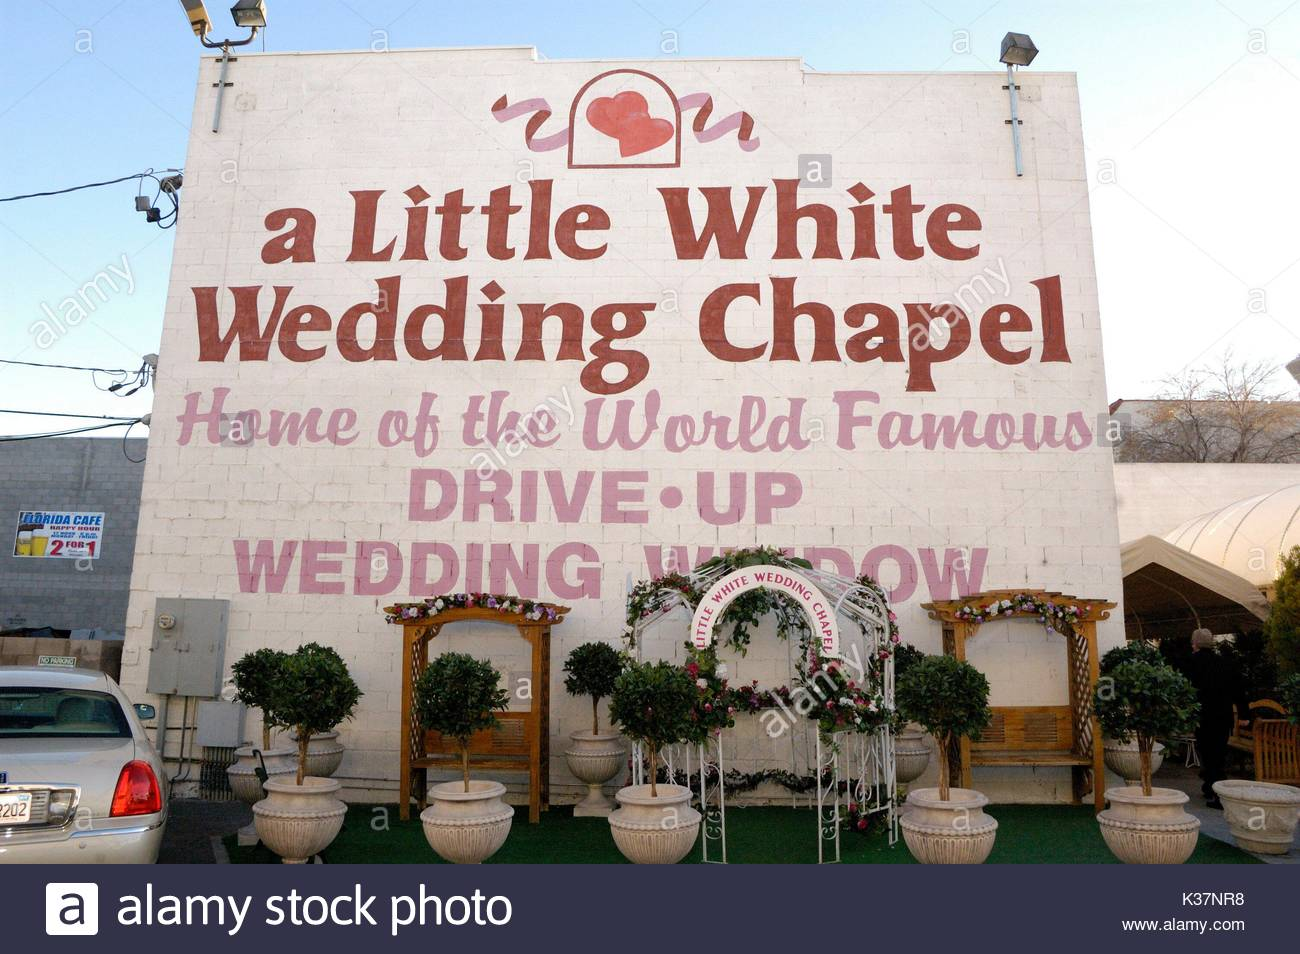 Las Vegas Little White Chapel Stock Photos Amp Las Vegas Little White Chapel Stock Images